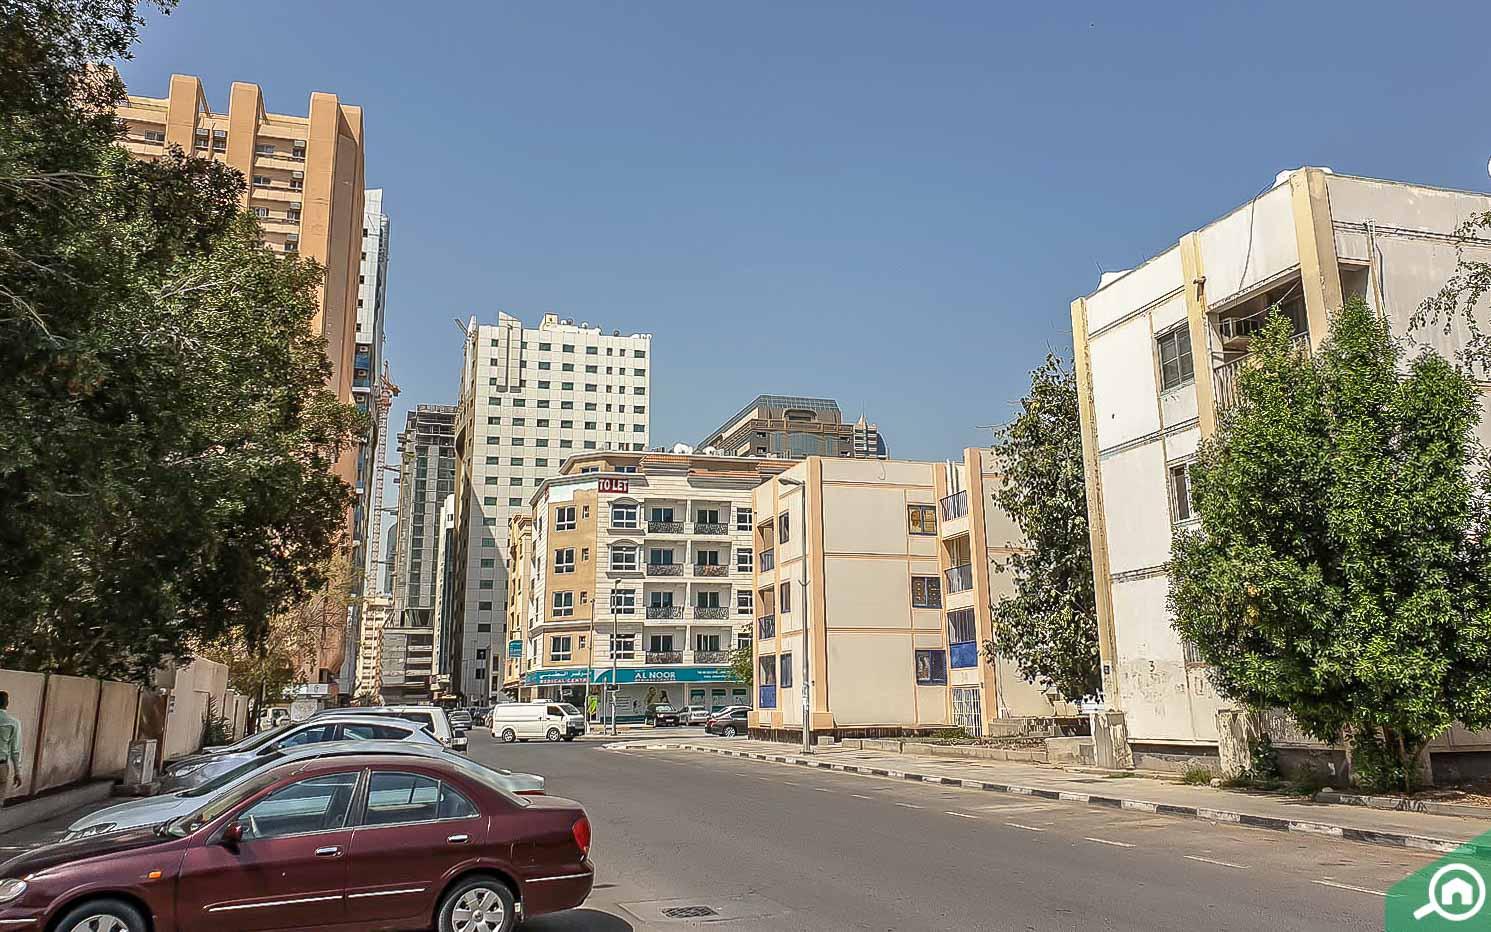 Abu Shagara apartments